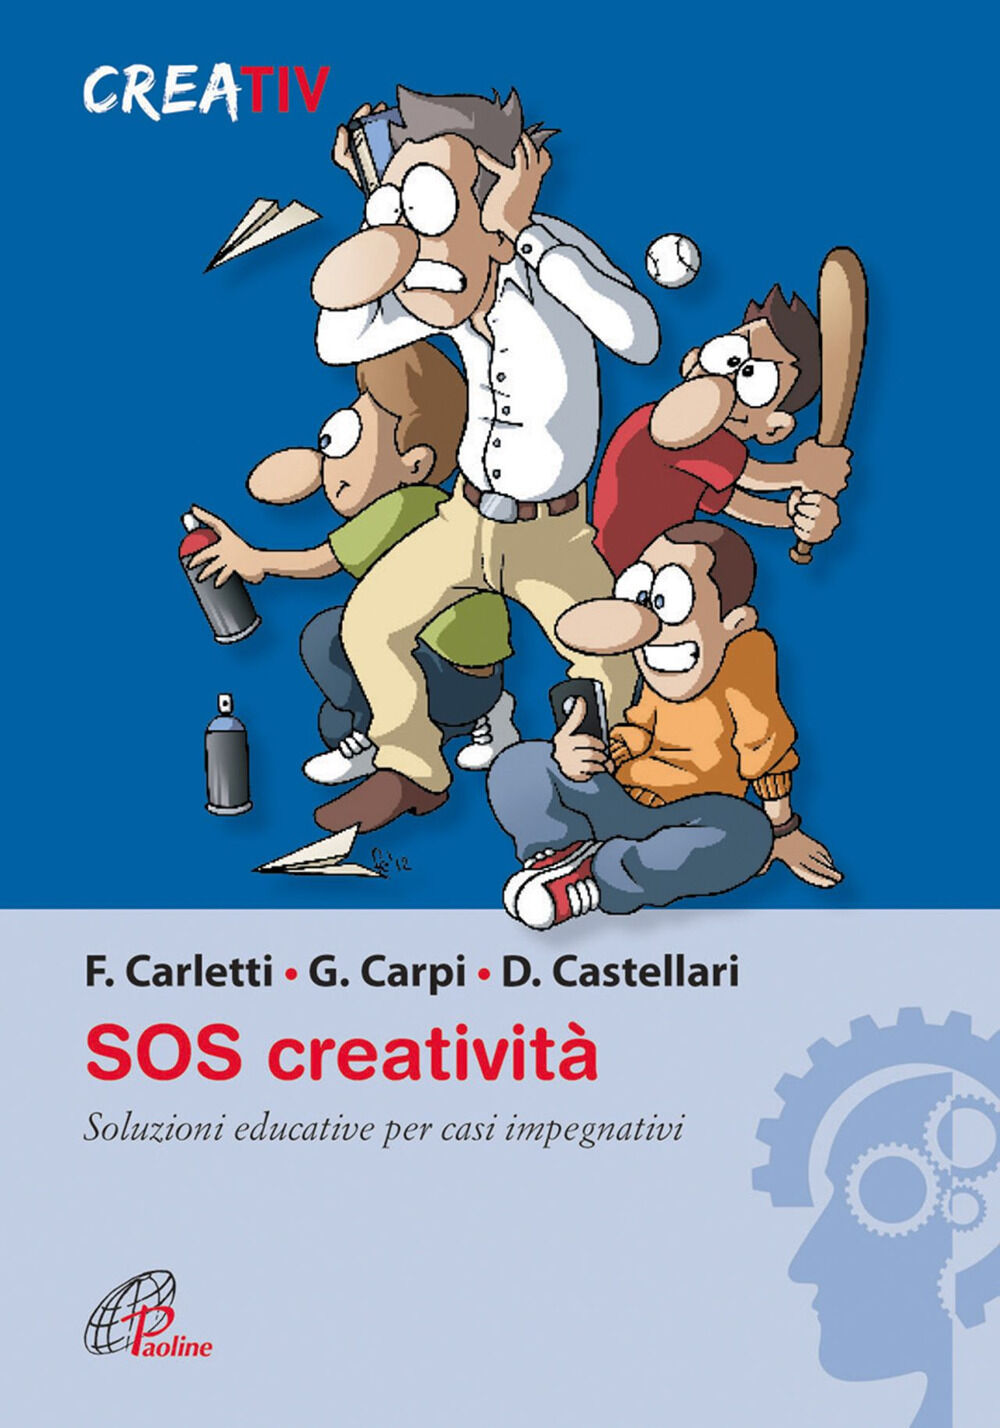 SOS creatività. Soluzioni educative per casi impegnativi